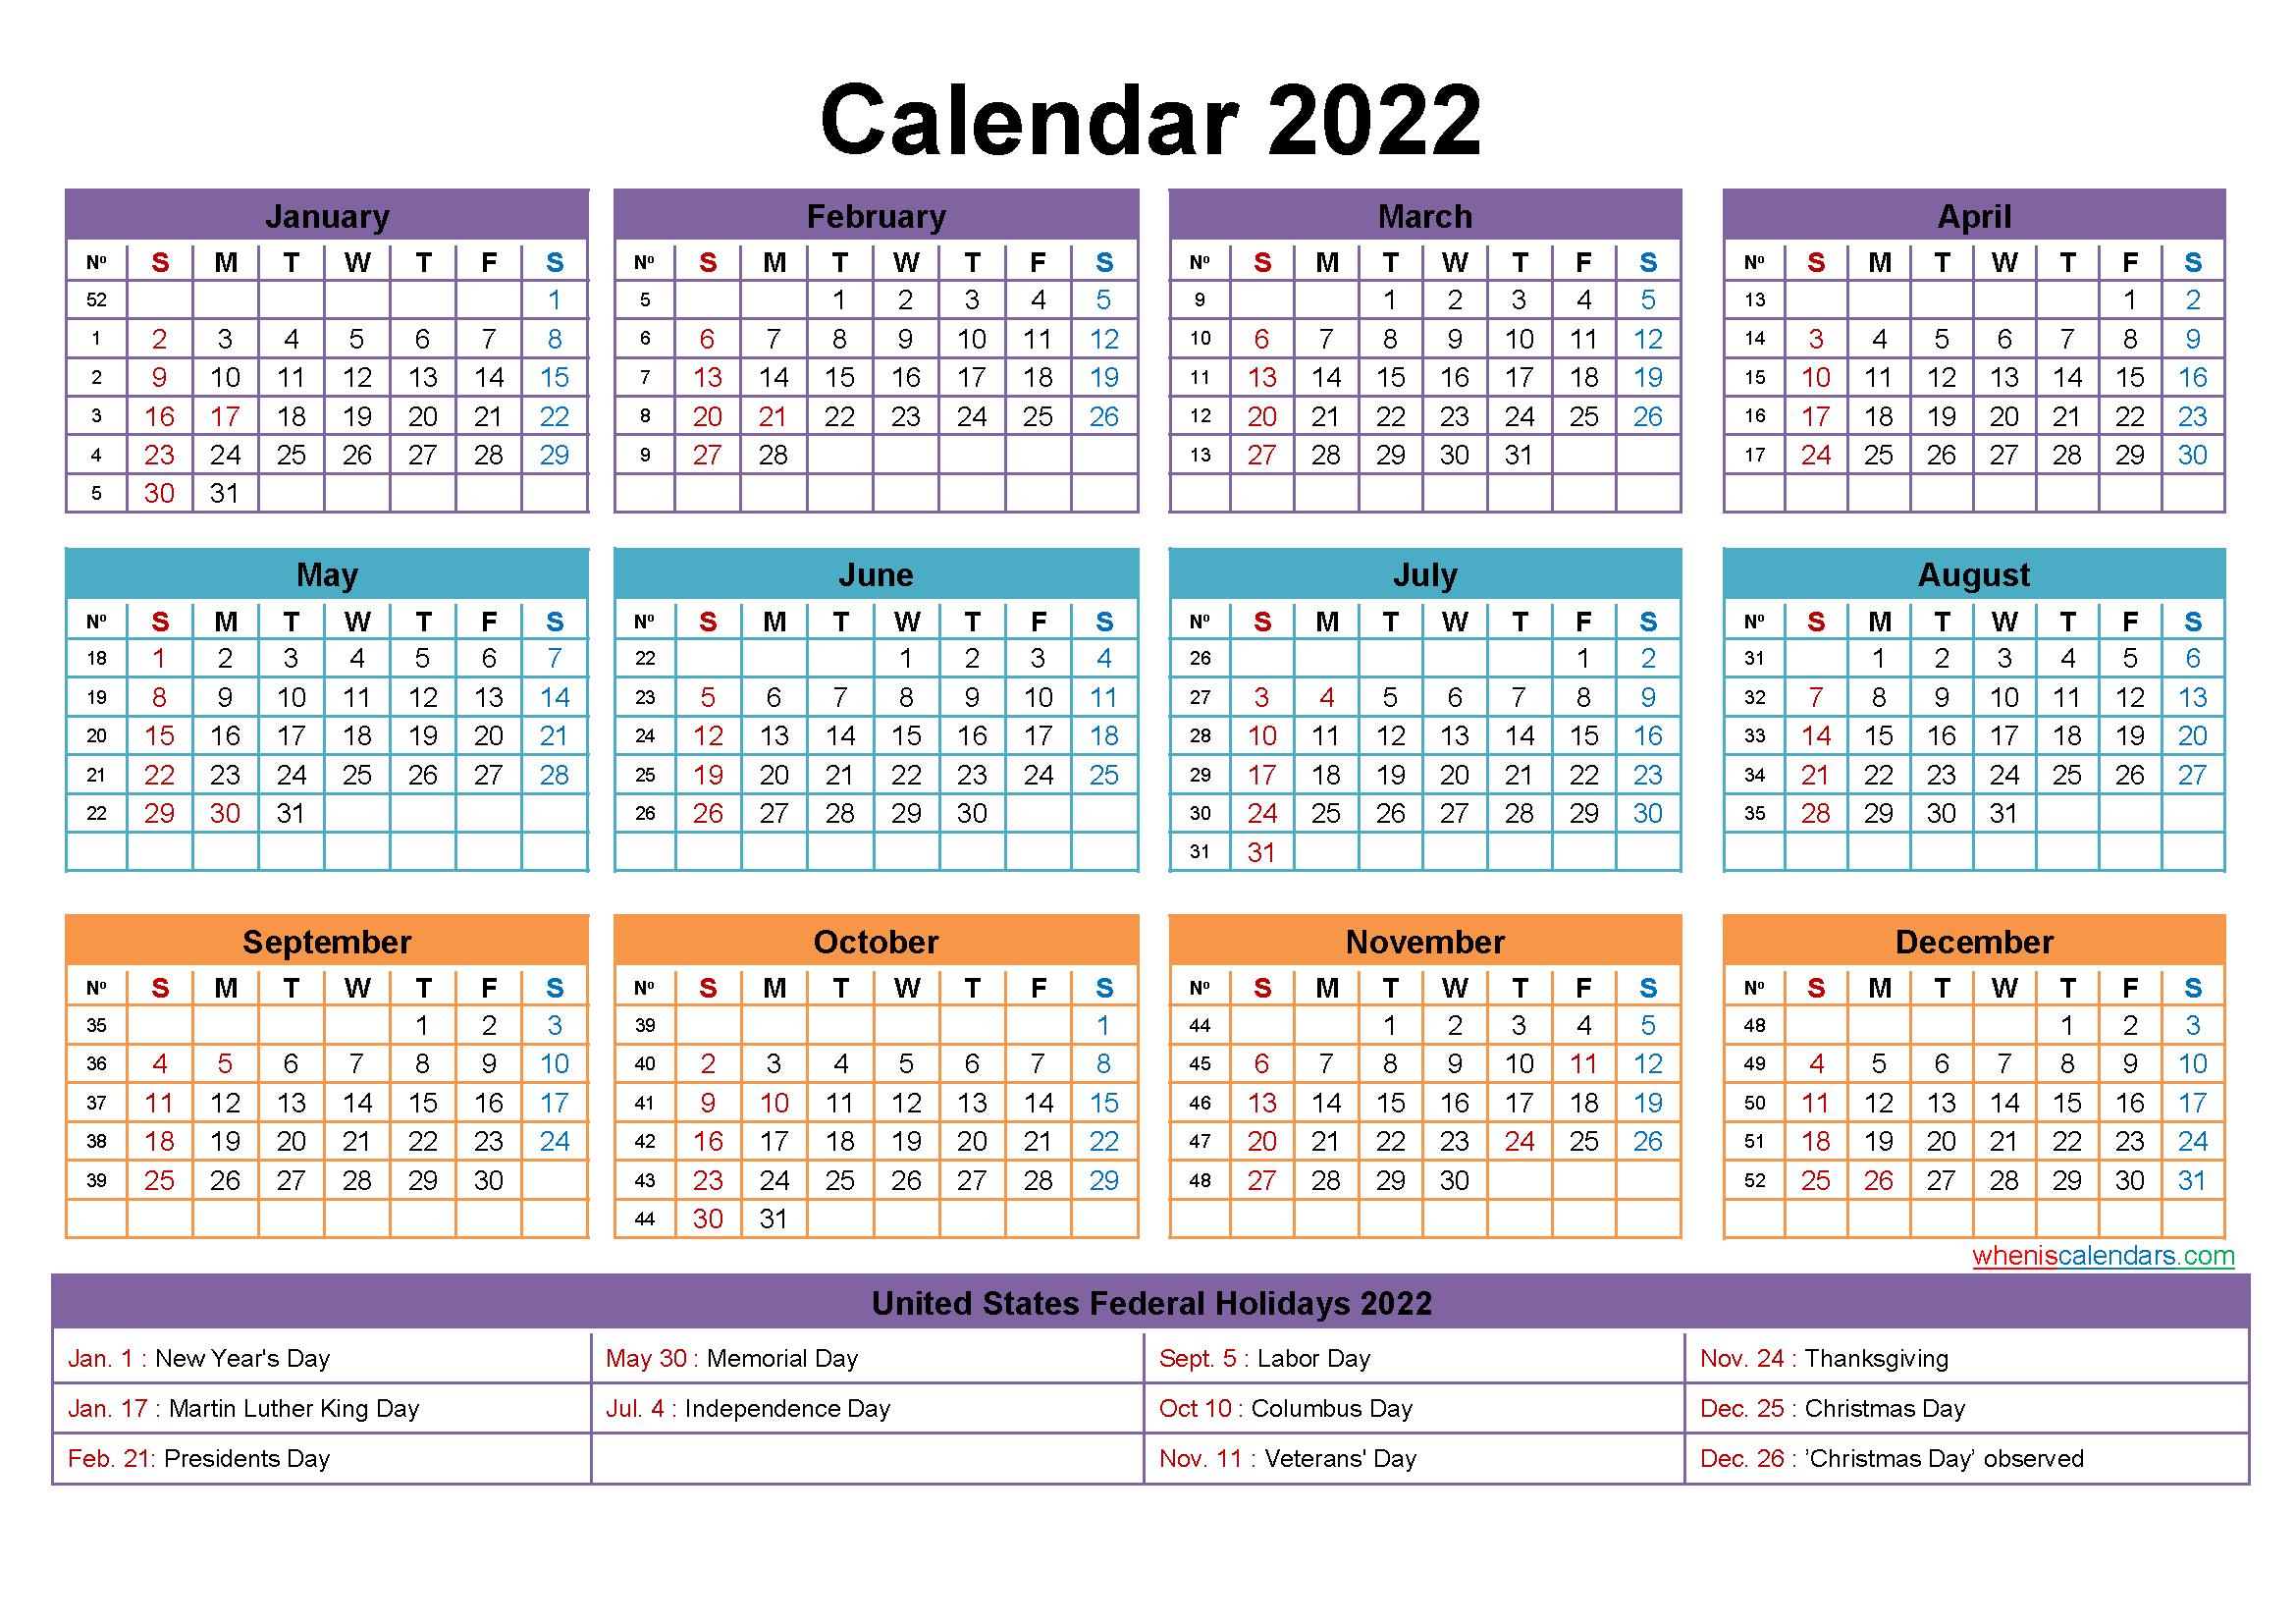 Free Editable Printable Calendar 2022 - Template No.ep22Y23 Editable 12 Month Calendar